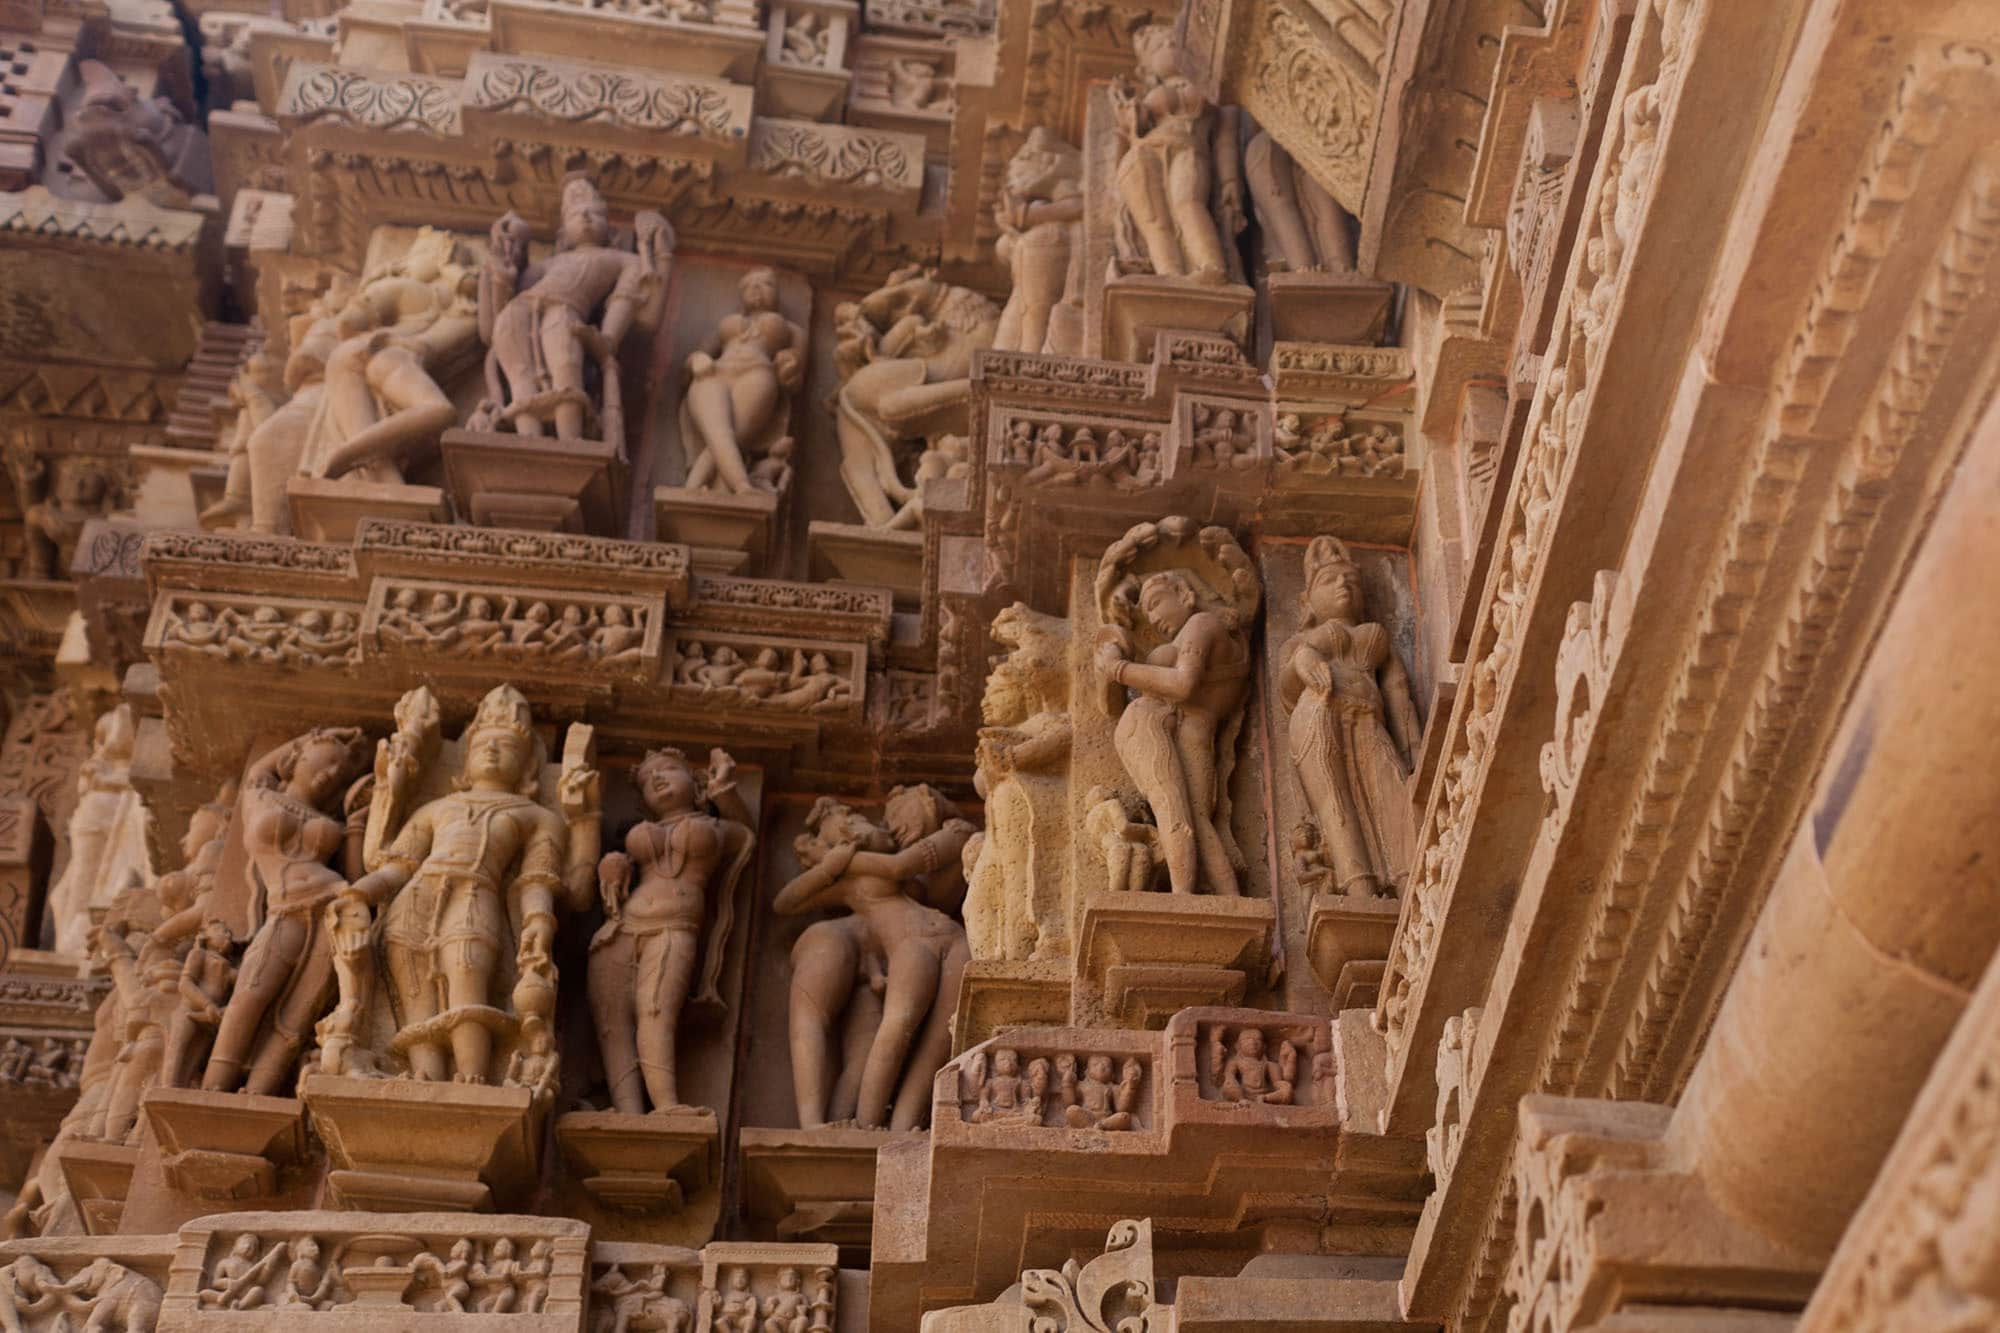 Khajuraho Sex Temples -- Western Group sex temples in Khajuraho, India.